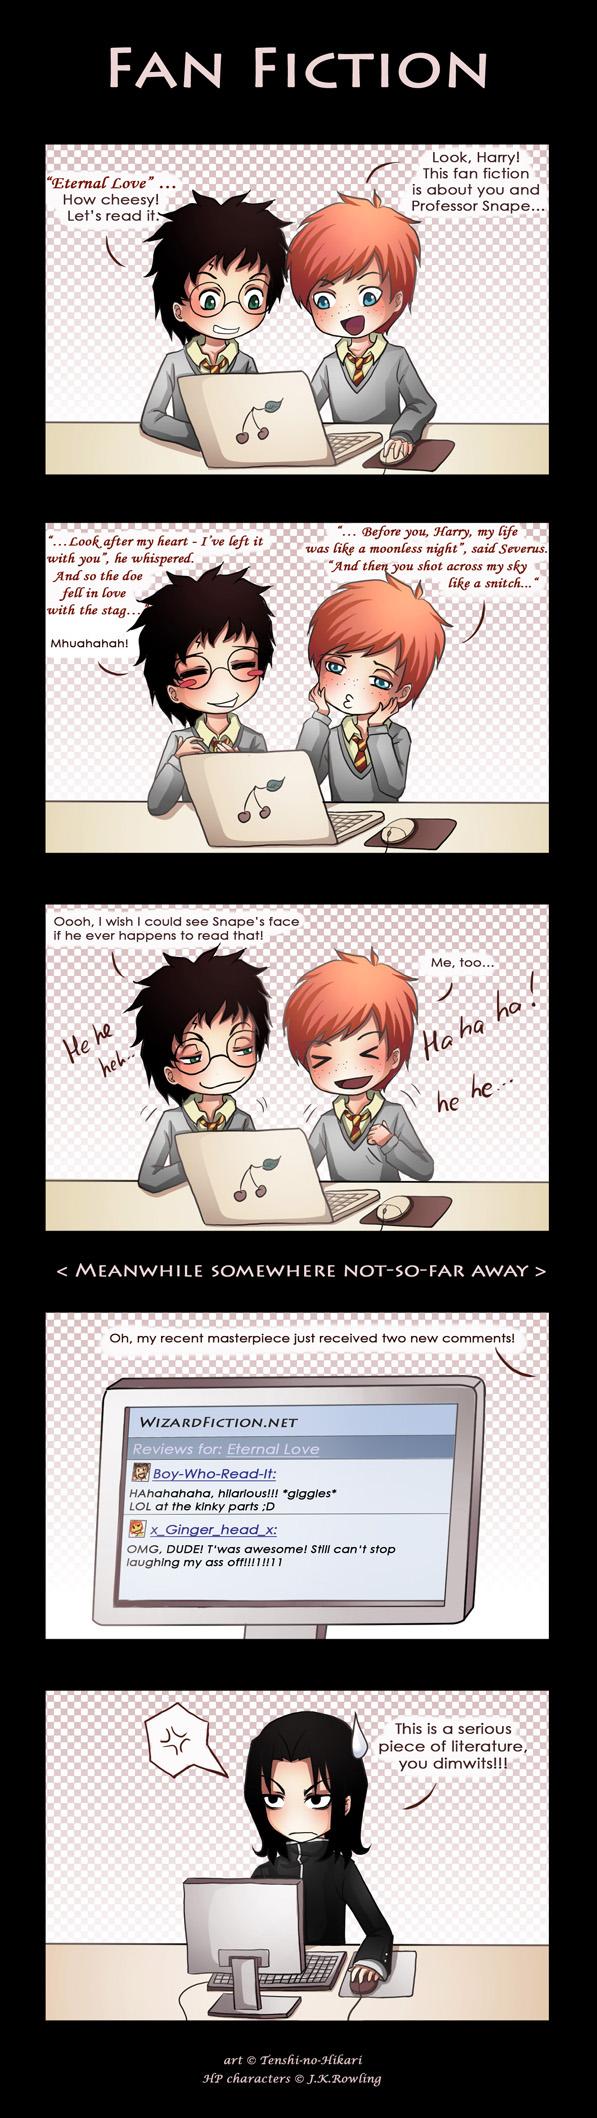 Tags: Anime, Tenshi-no-hikari, Harry Potter, Severus Snape, Ron Weasley, Harry Potter (Character), Comic, deviantART, Gryffindor House